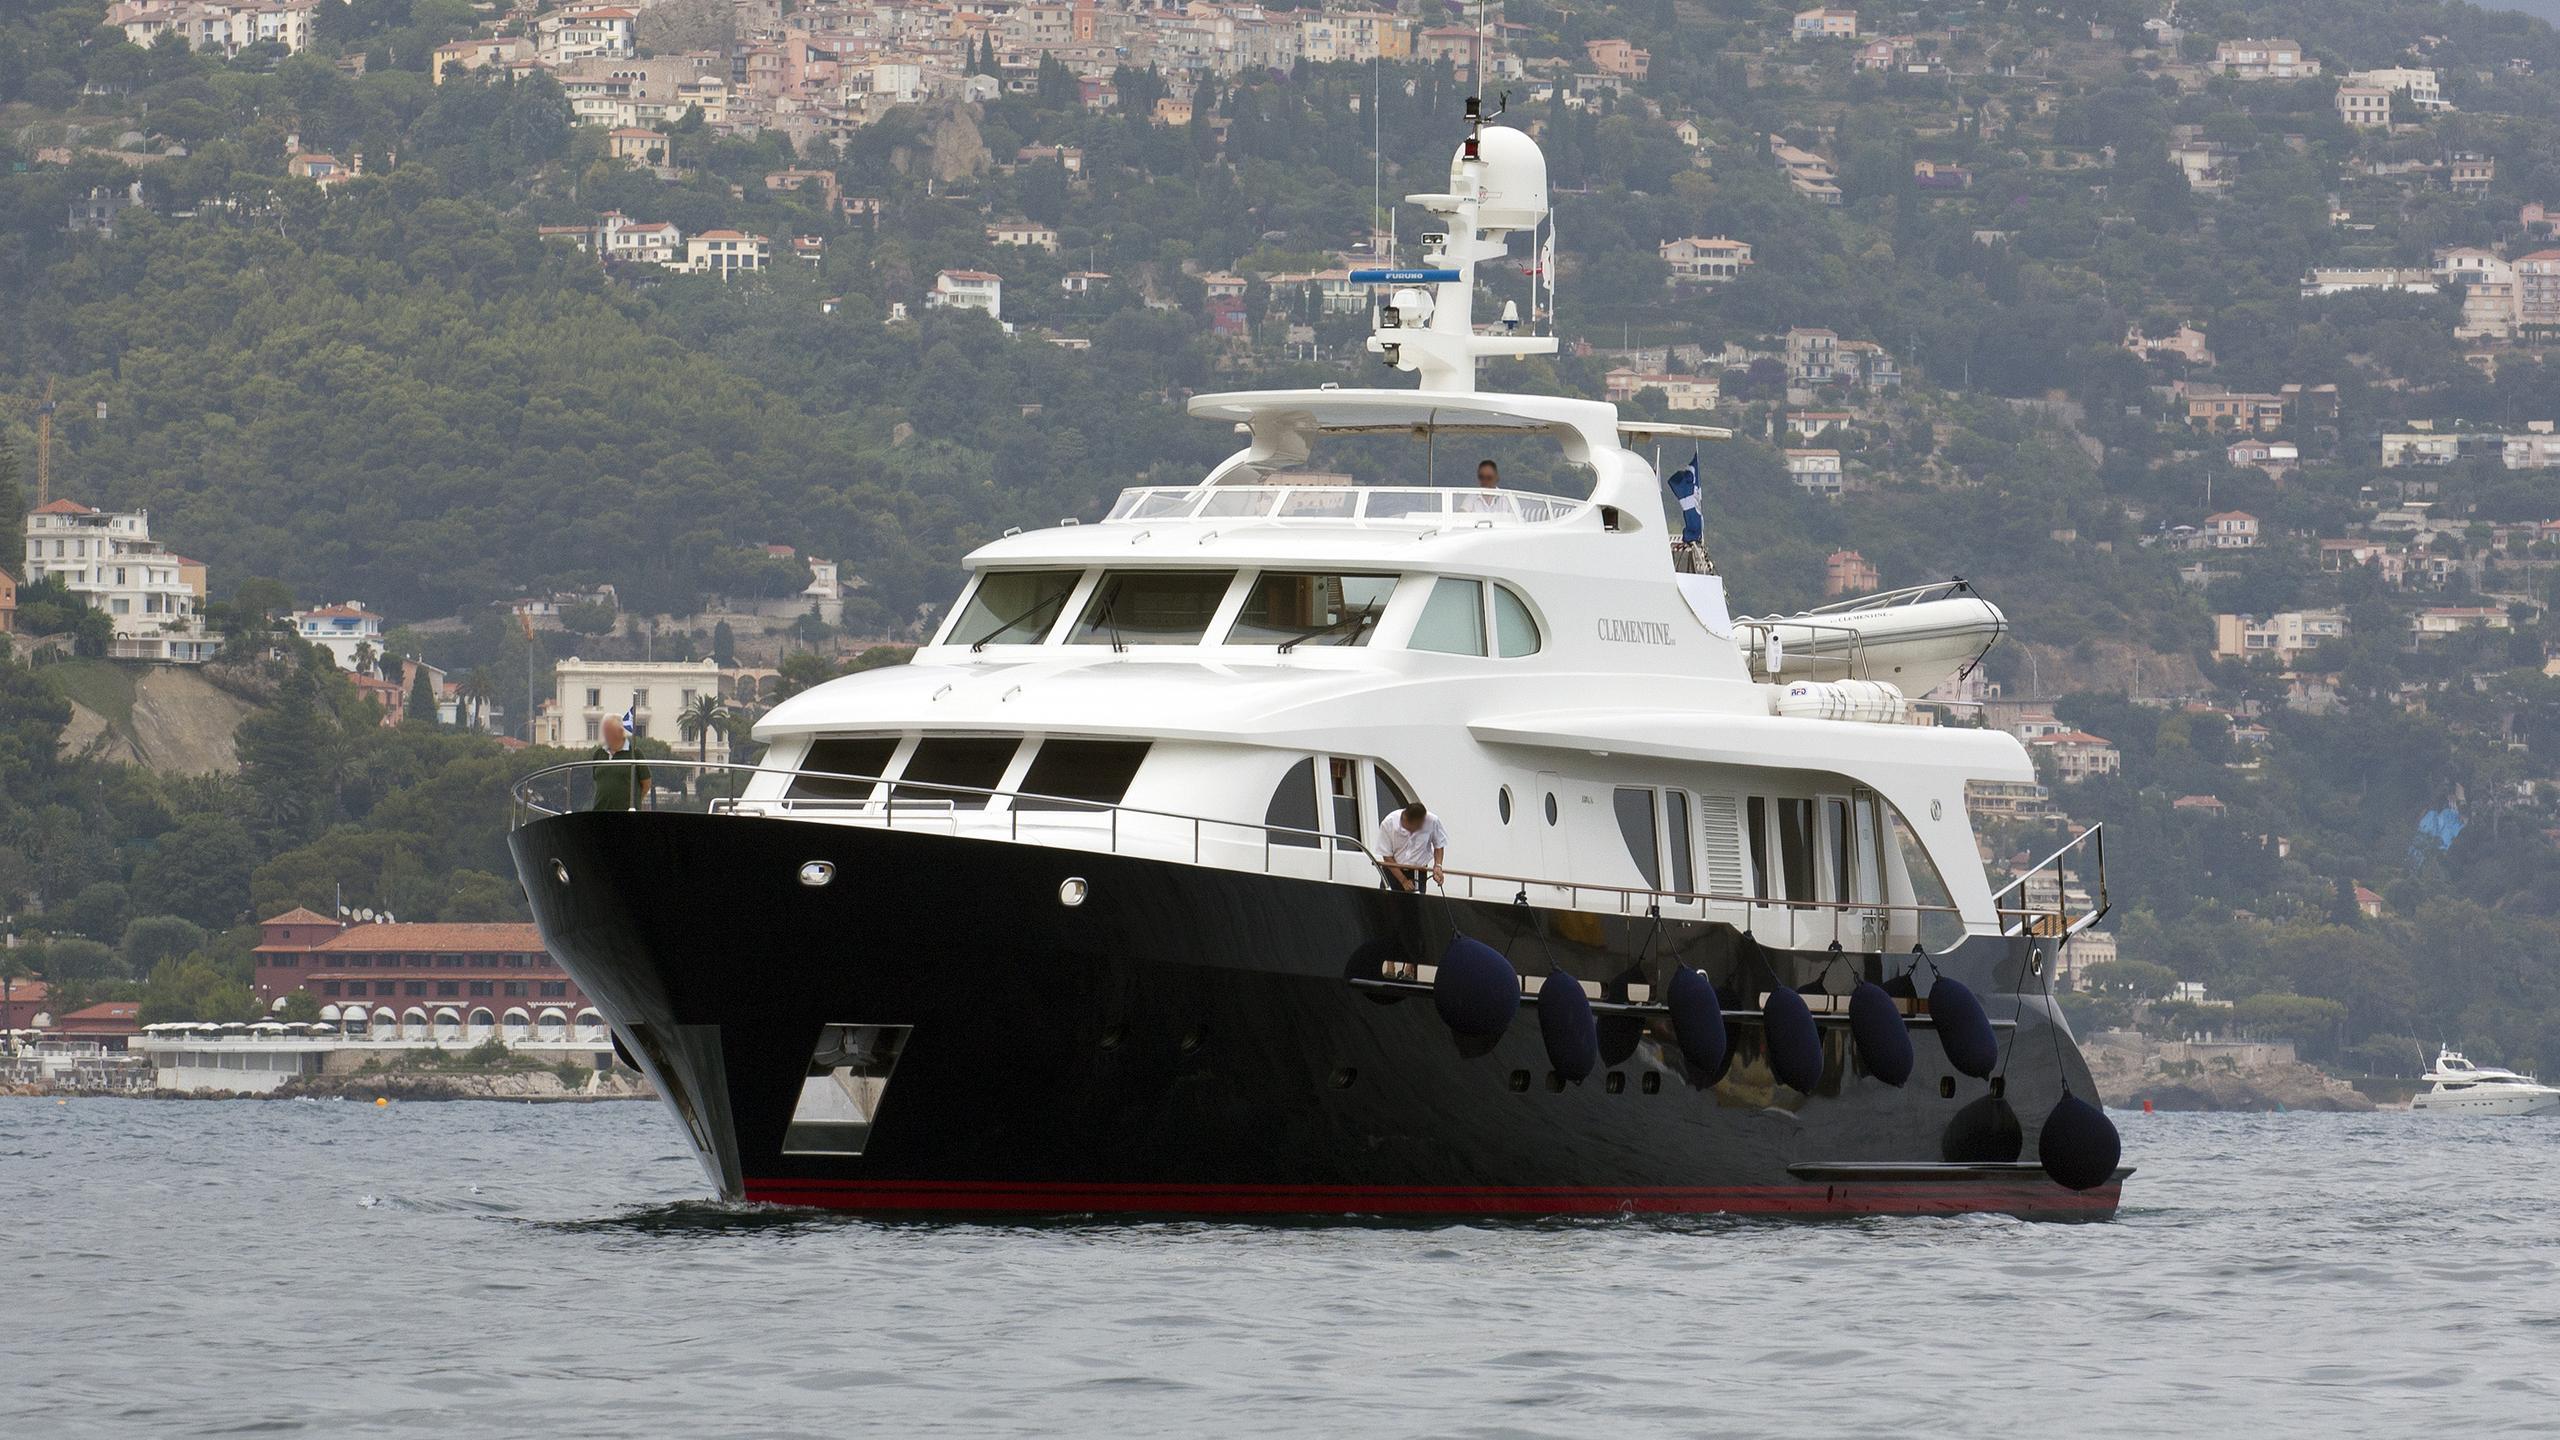 clementine-motor-yacht-moonen-96-2005-29m-front-profile